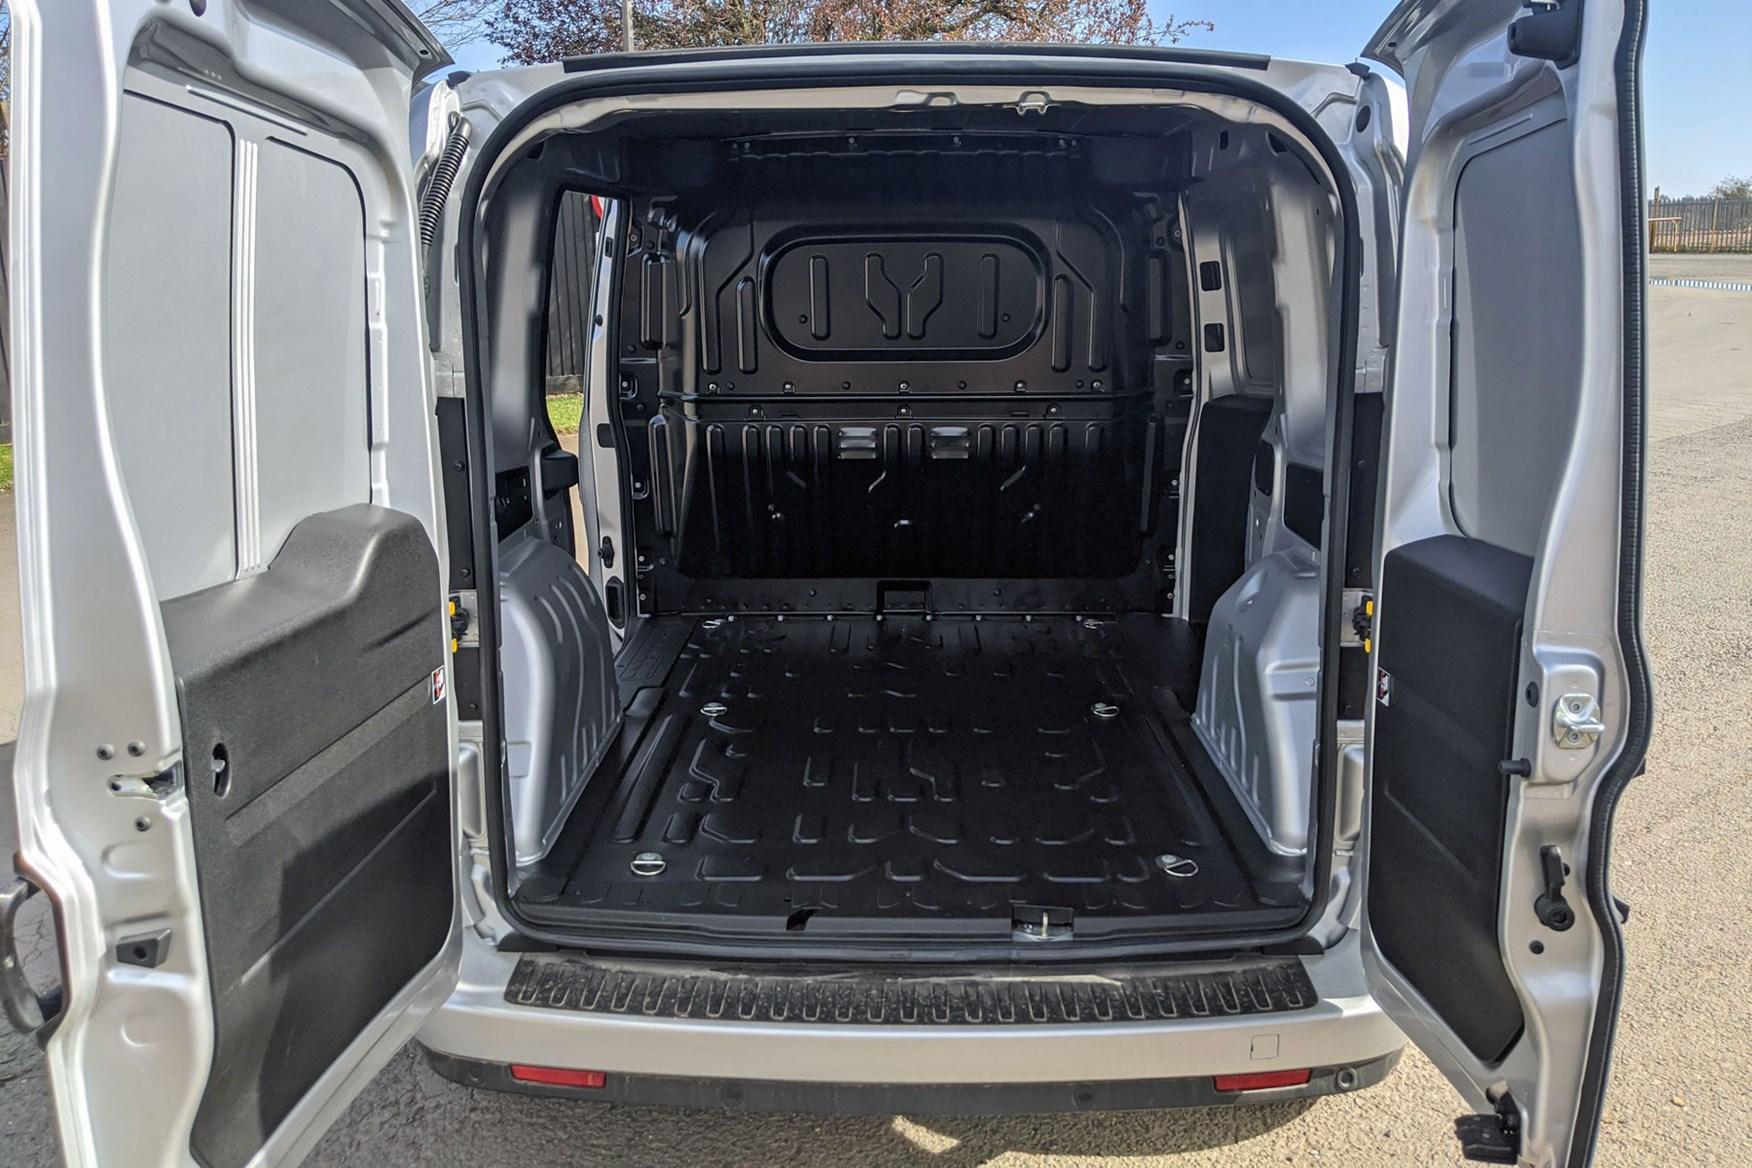 Fiat Doblo Cargo load area, payload